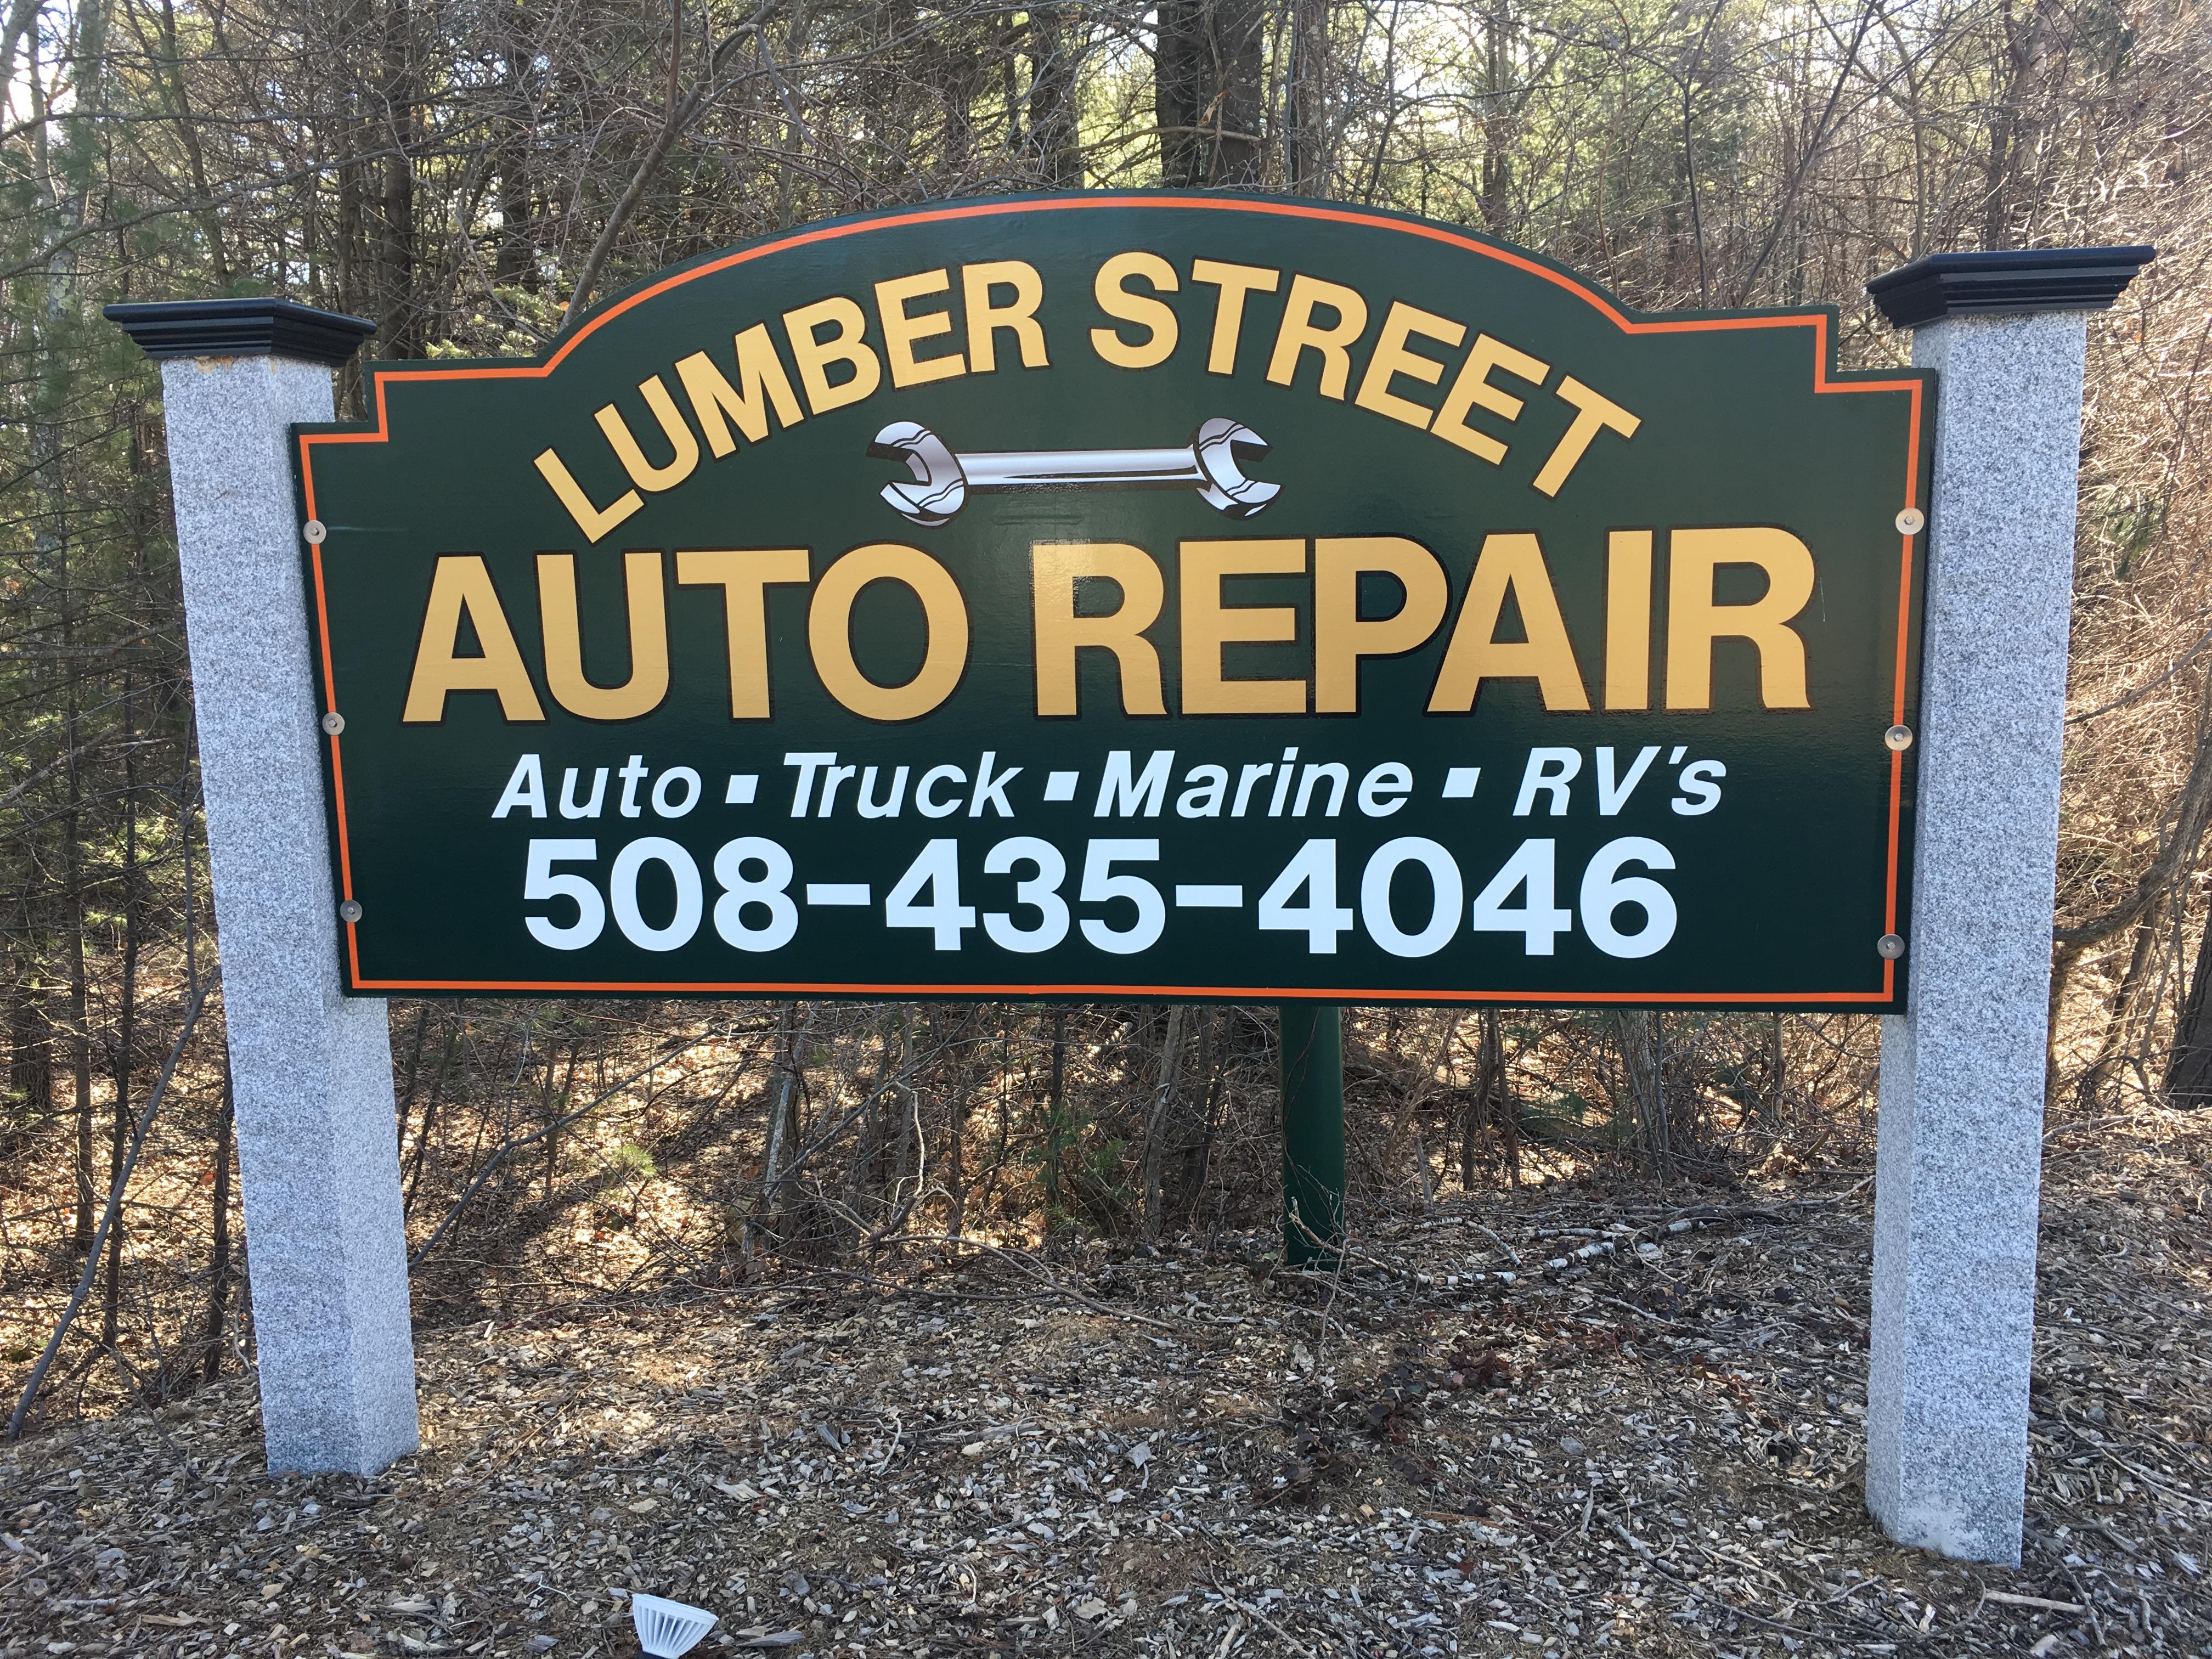 Lumber Street Auto